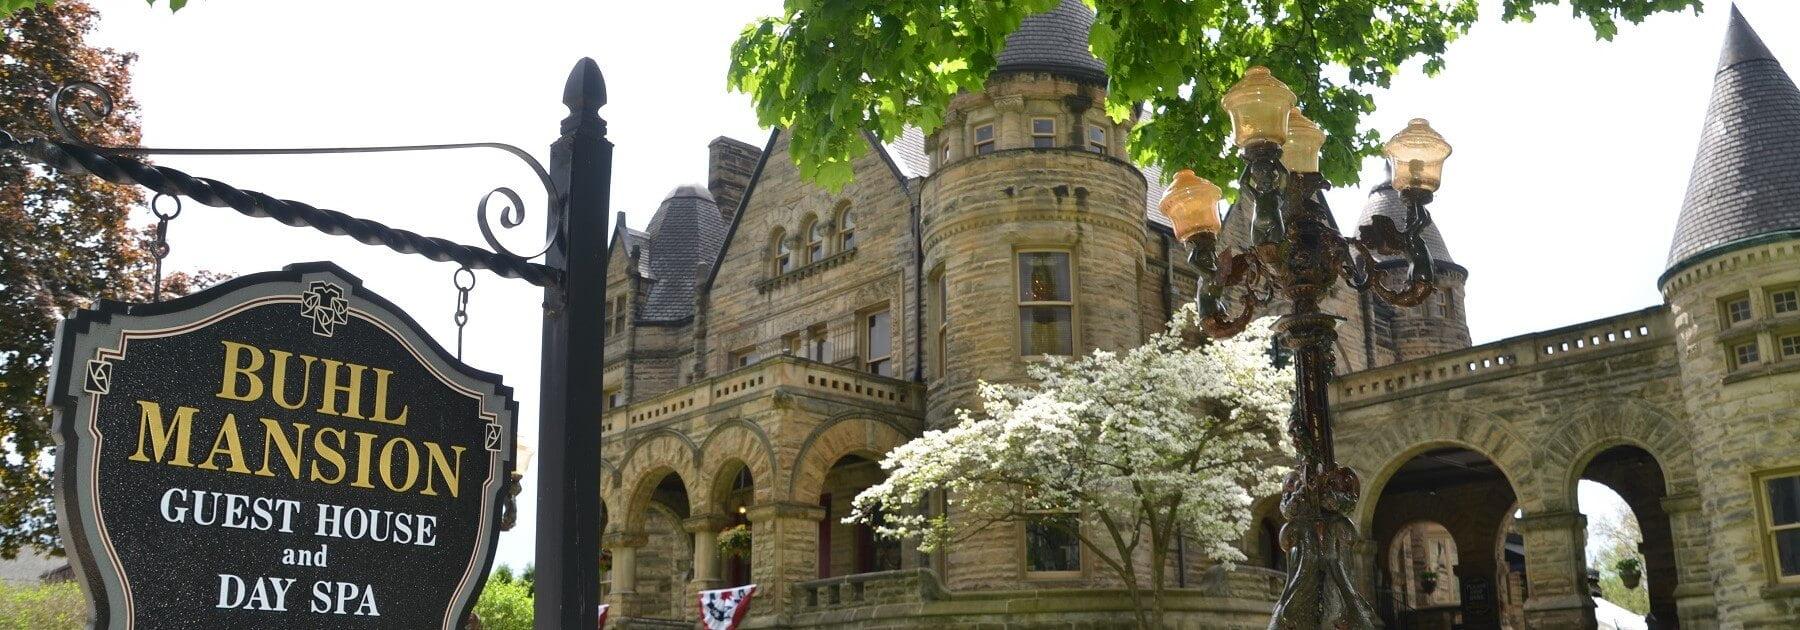 Buhl Mansion Exterior Spring